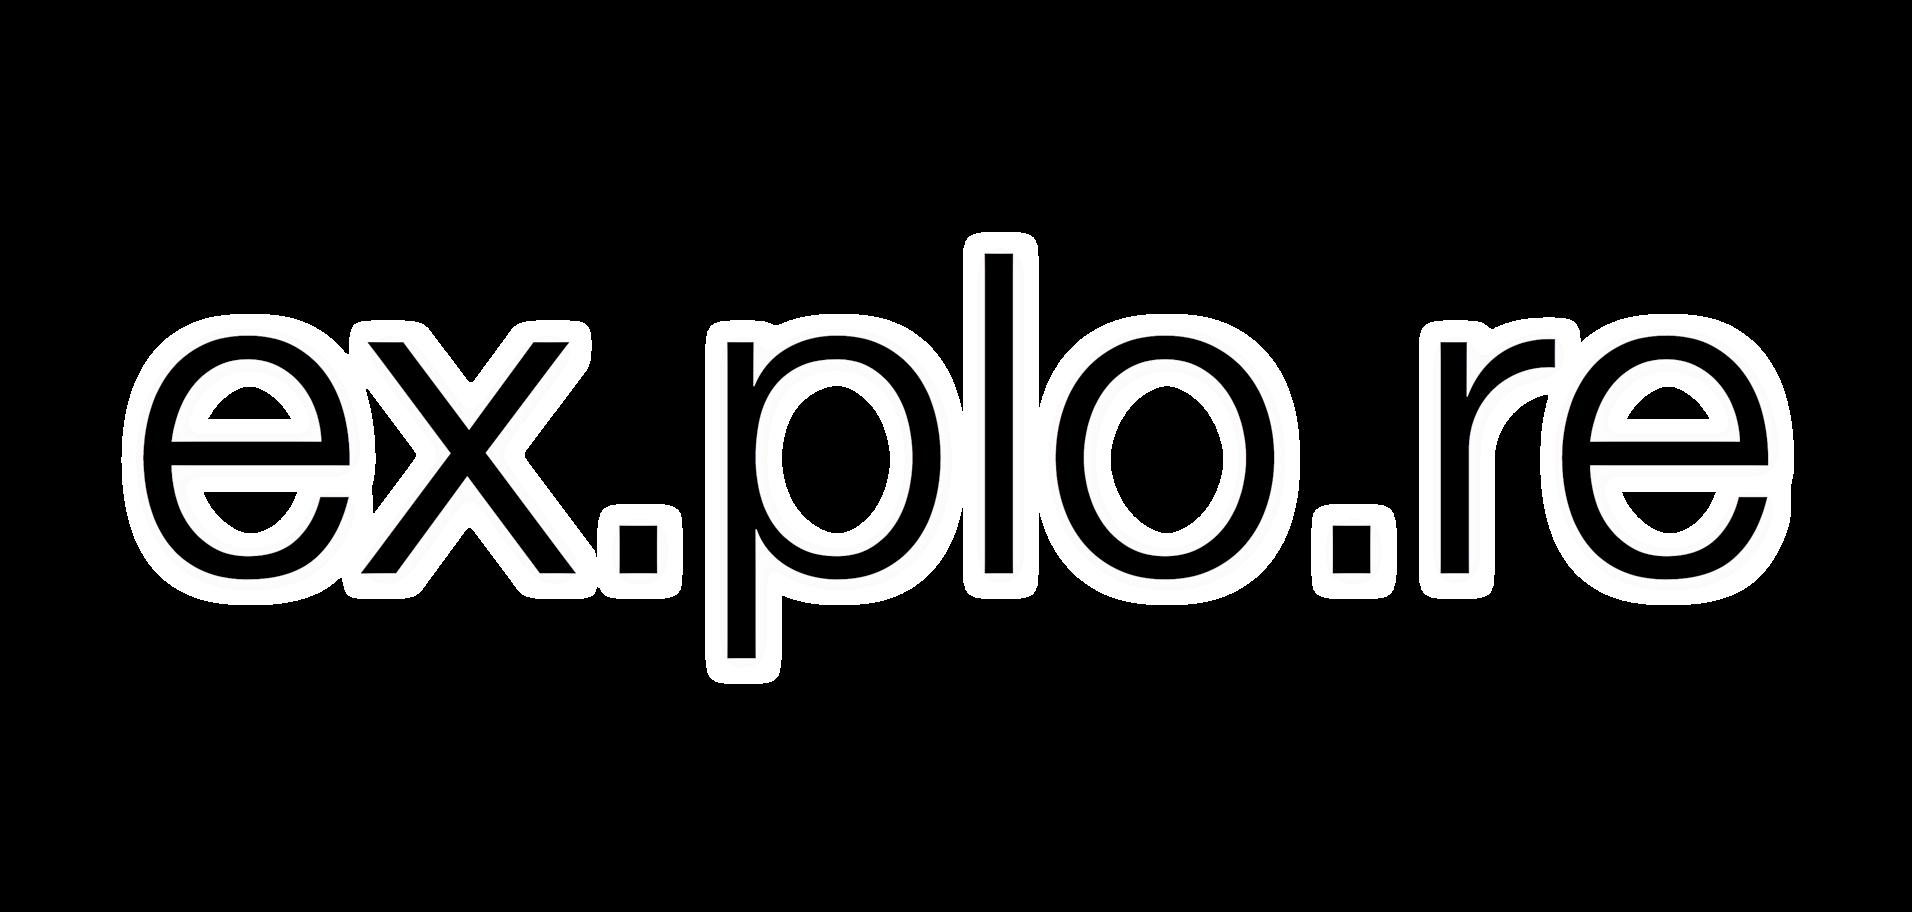 ex.plo.re